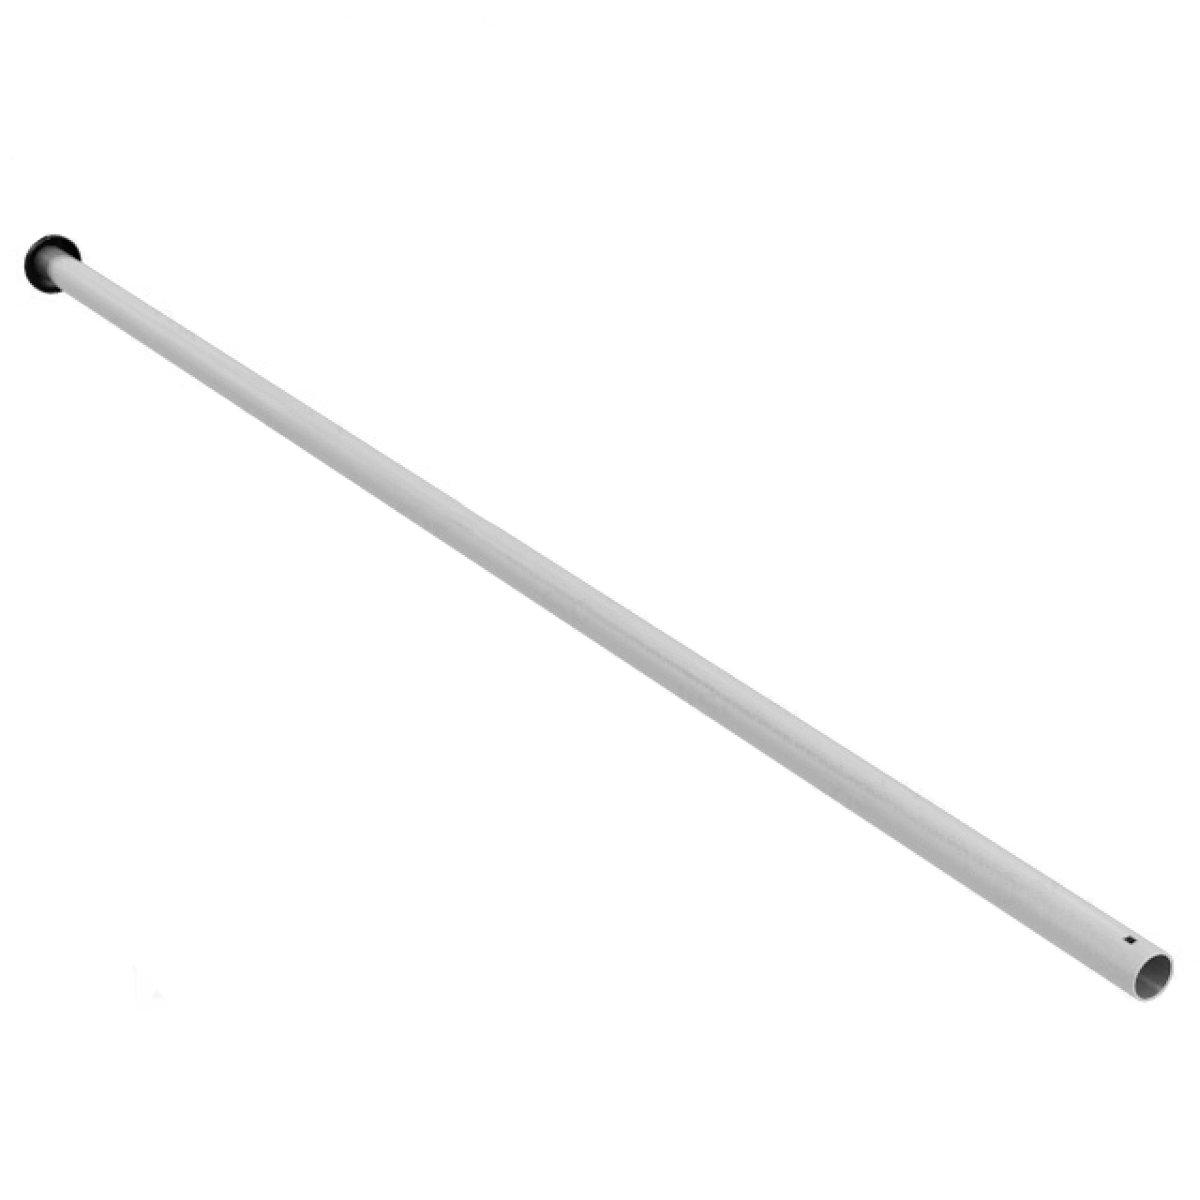 Ampel 24 - Barra superior para red de seguridad para cama elastica | longitud: ca 125cm | Diametro: ca 2,8cm | adecuado para cama elastica de 3,05m